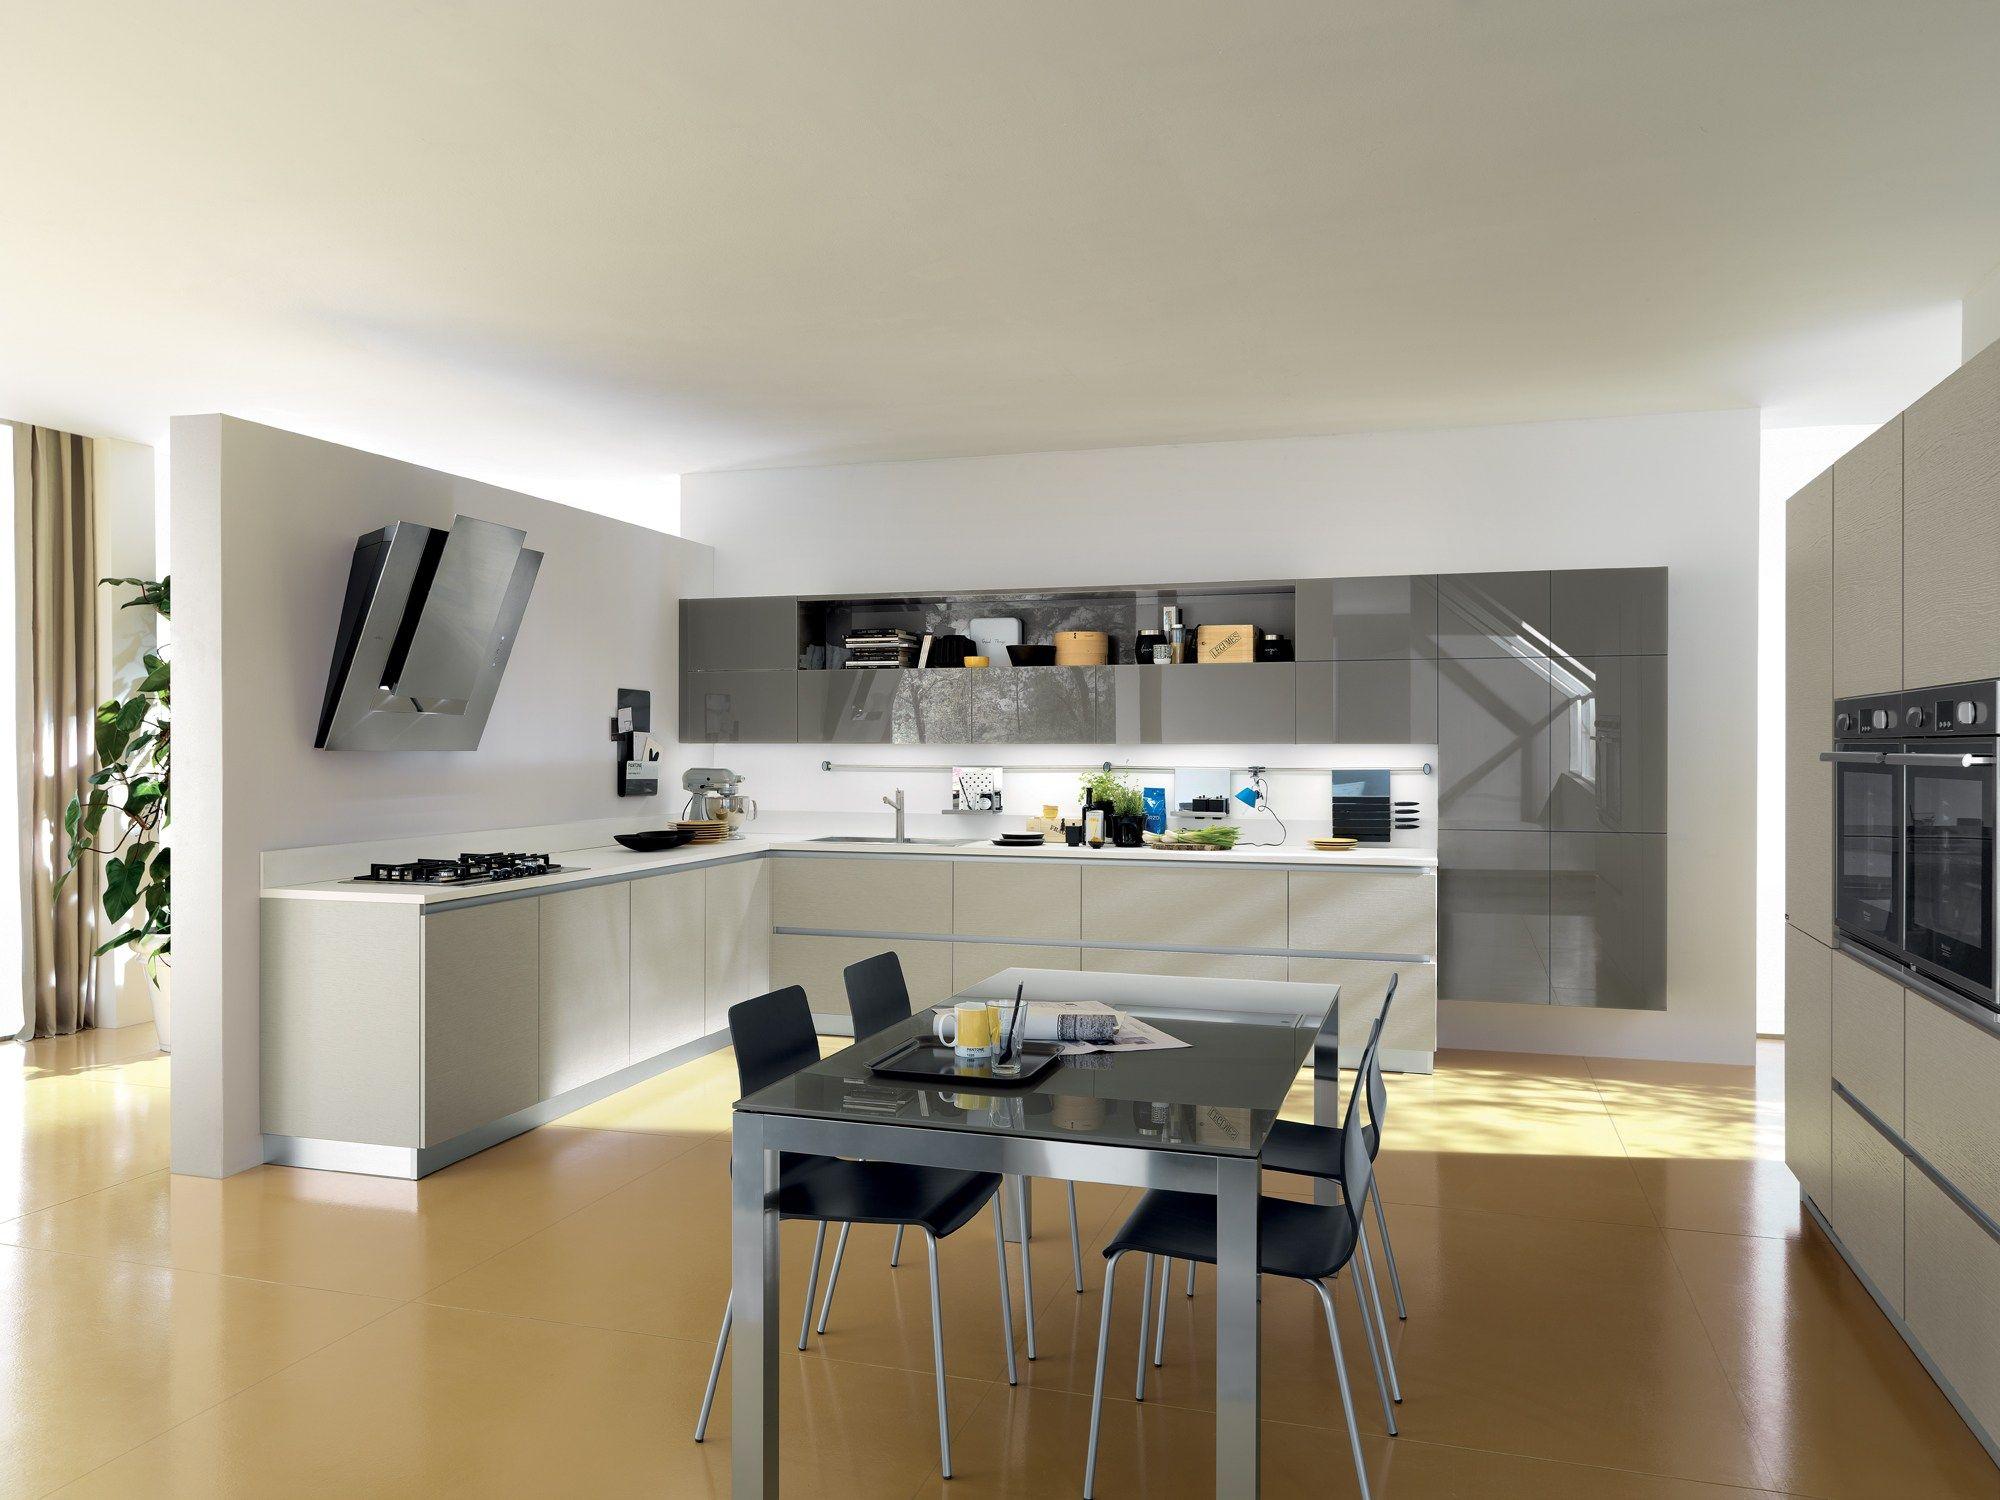 Fitted kitchen liberamente scavolini line by scavolini design vuesse design - Software cucine 3d ...